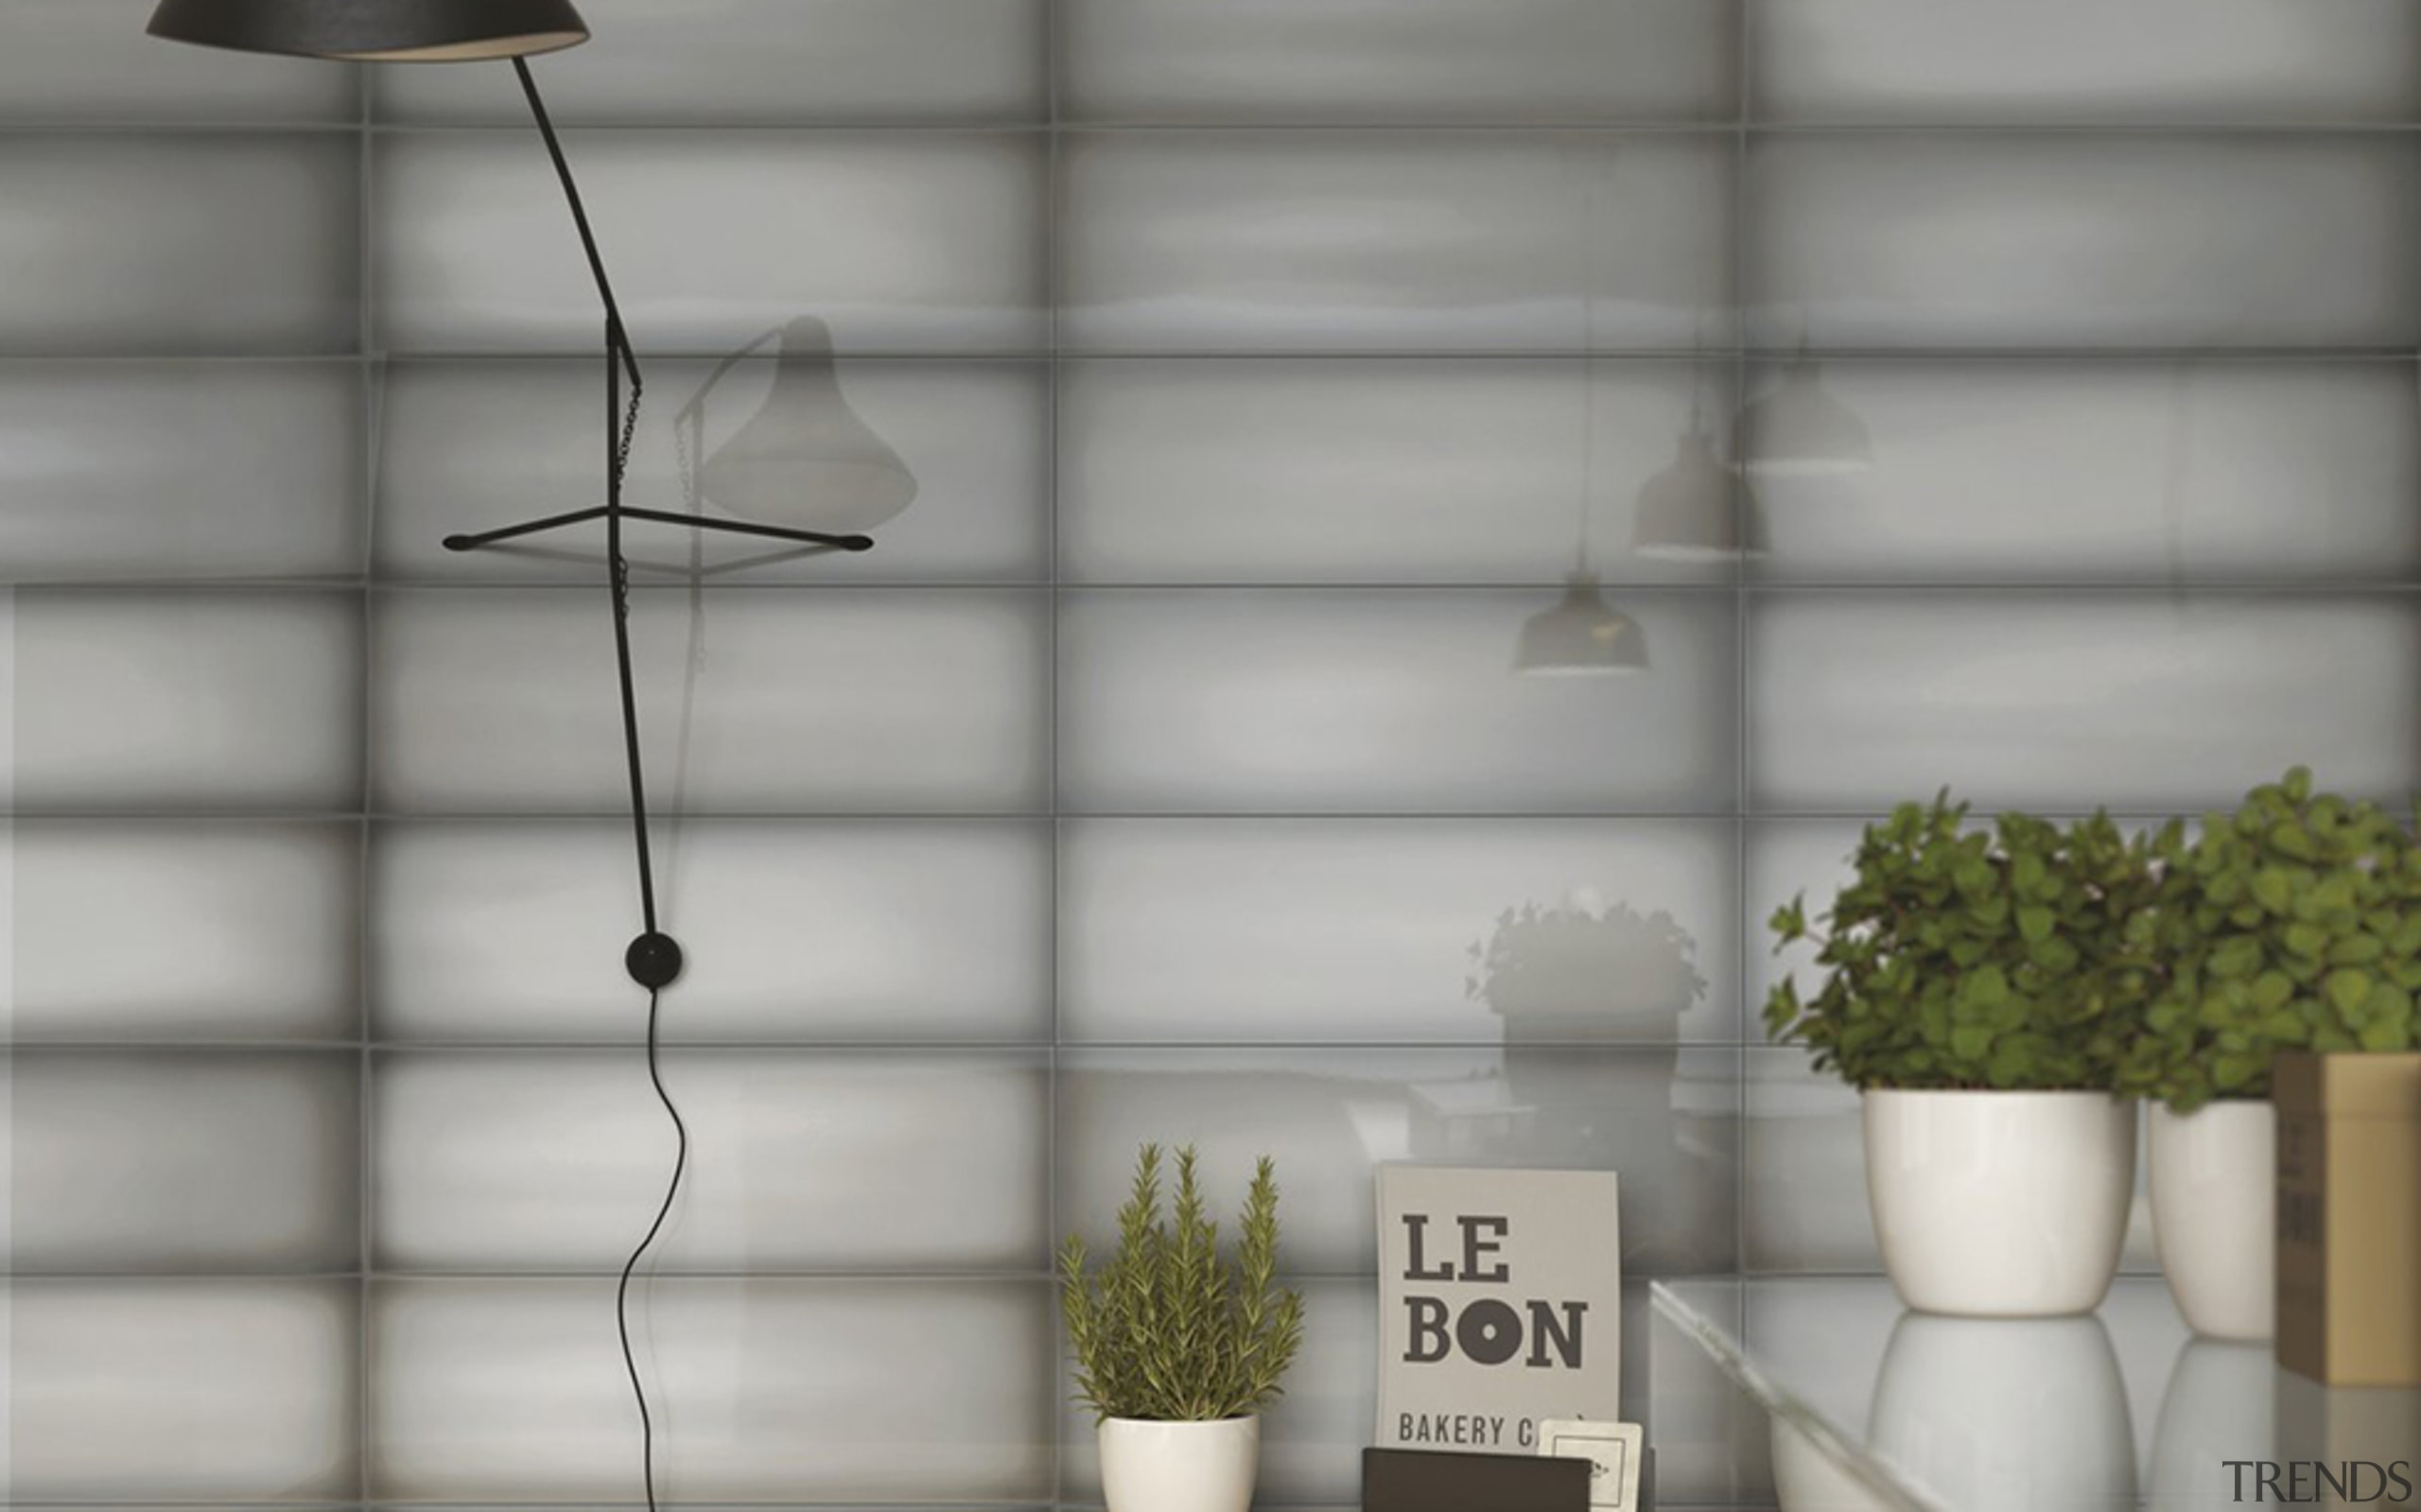 Slide Grey 100x300 - interior design | light interior design, light fixture, wall, window, gray